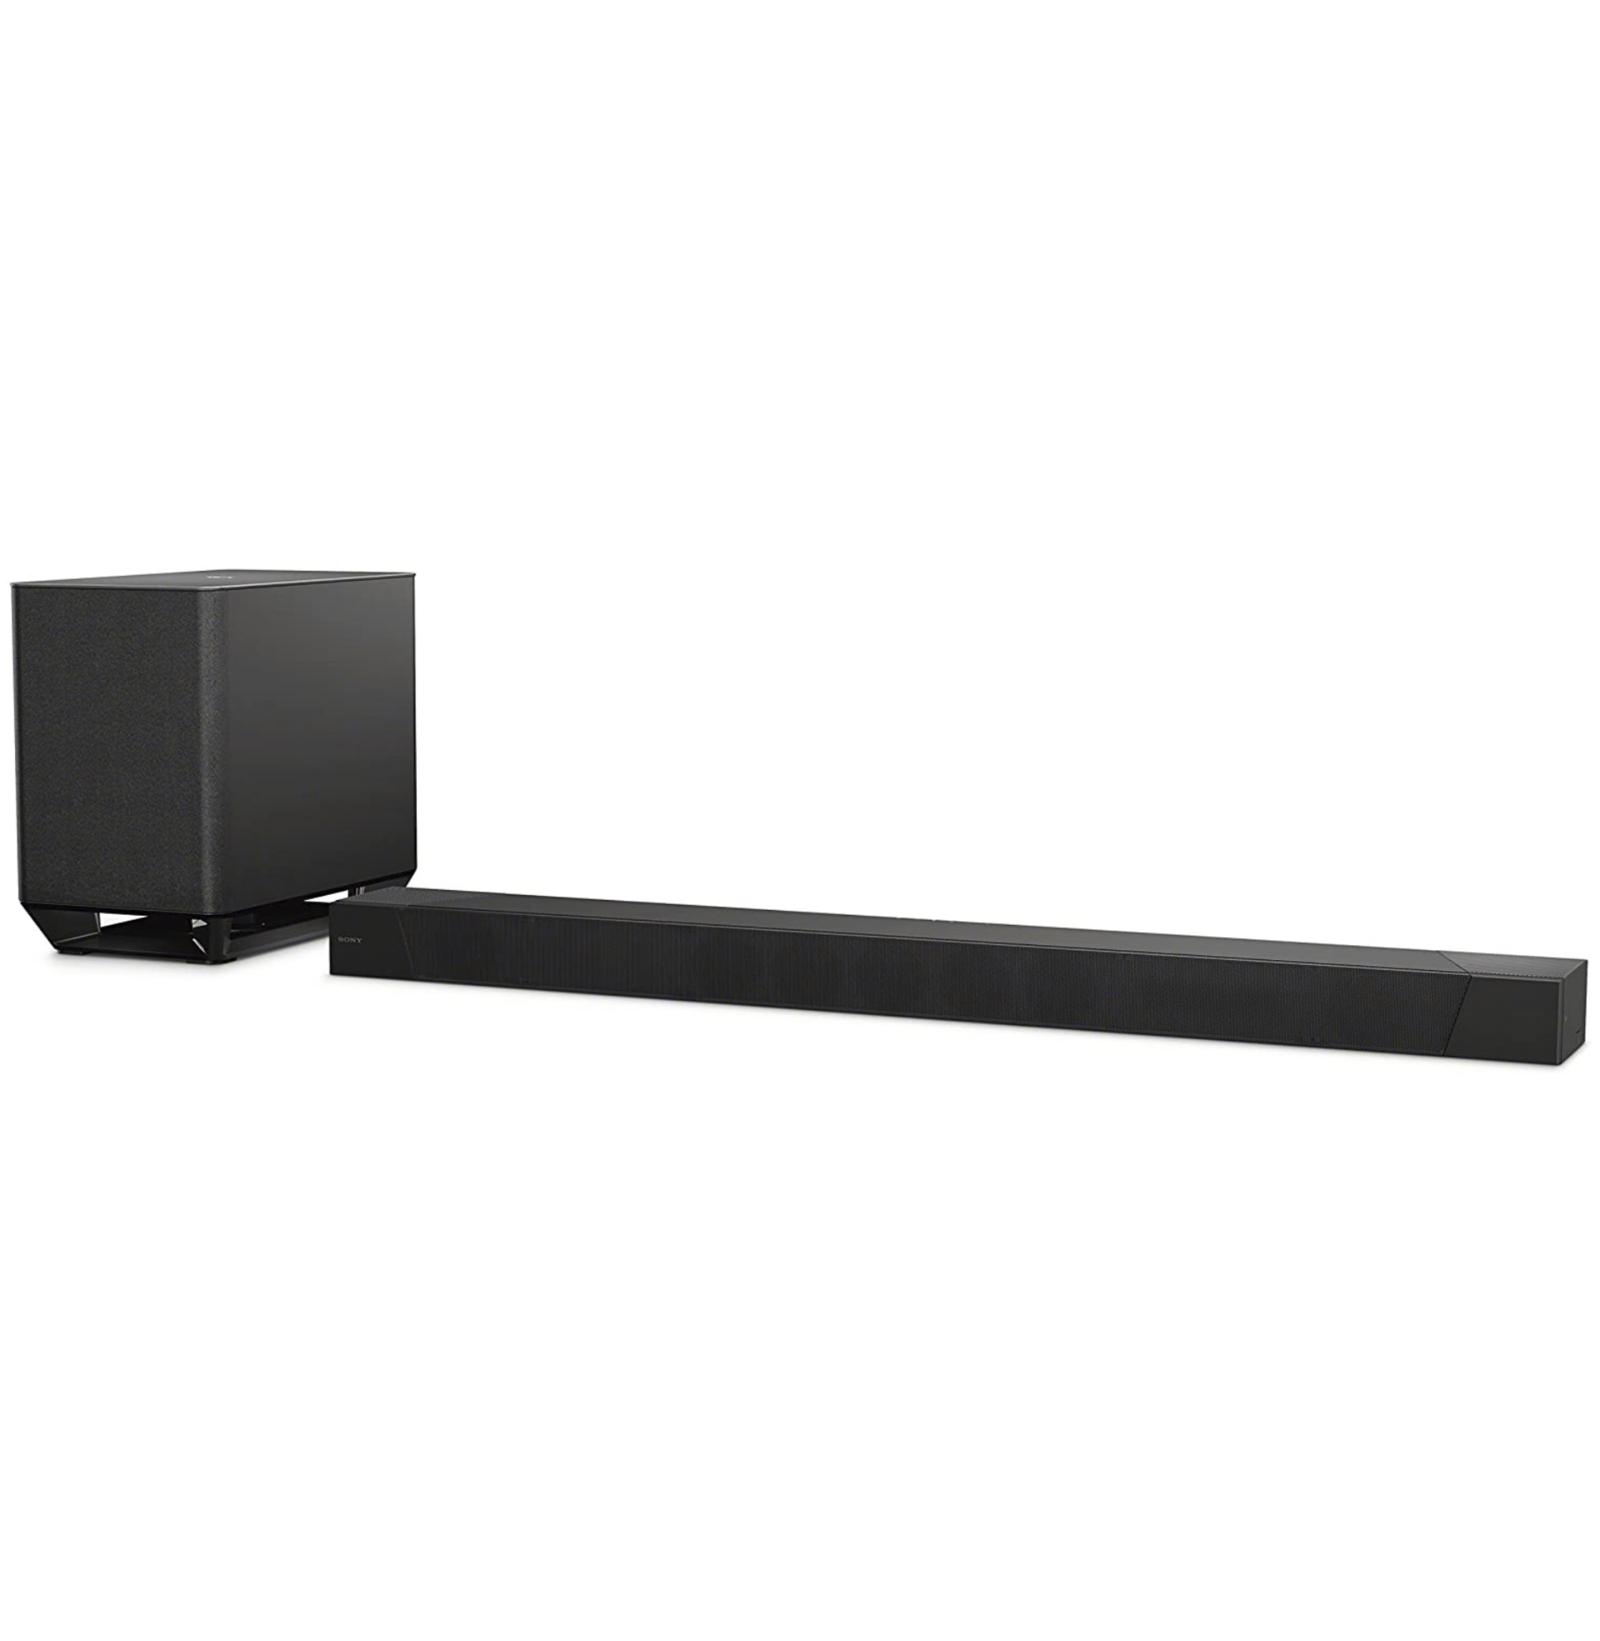 Sony HT-ST5000 Soundbar  7.1.2 ch Dolby Atmos / DTS:X  + Subwoofer 800w - 220v